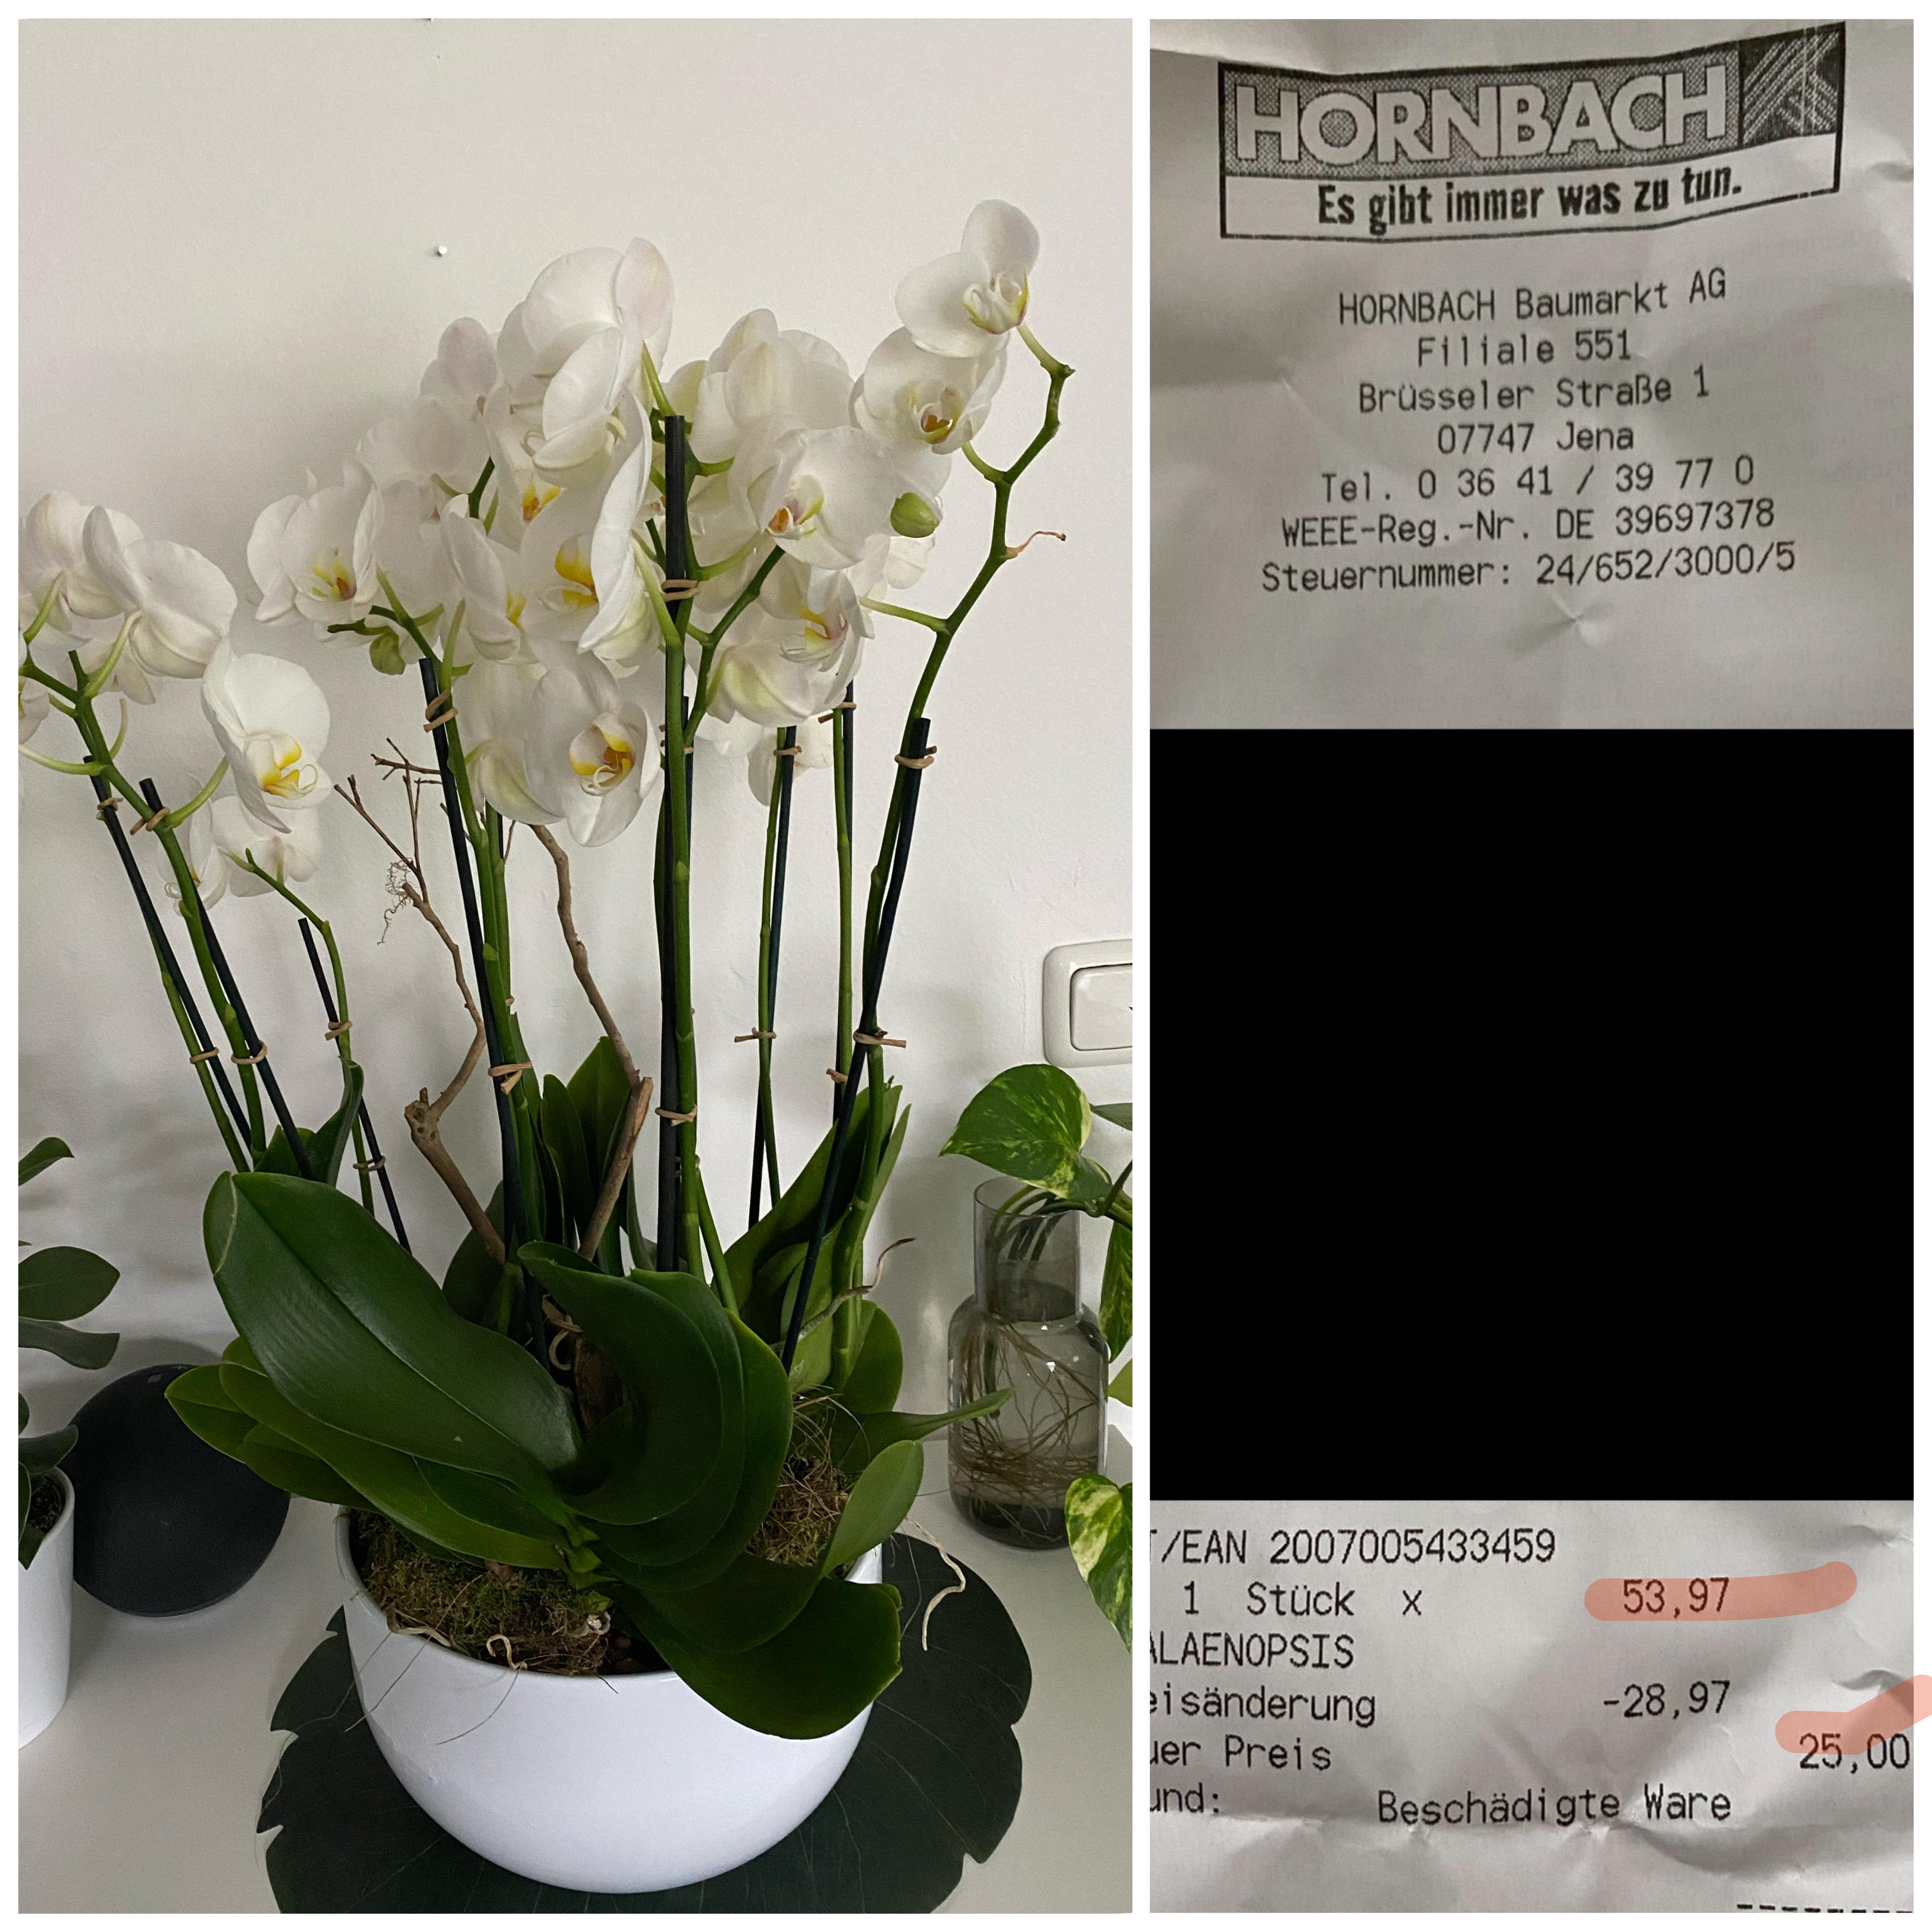 HORNBACH Jena (Lokal?) Phalaenopsis /Orchideen